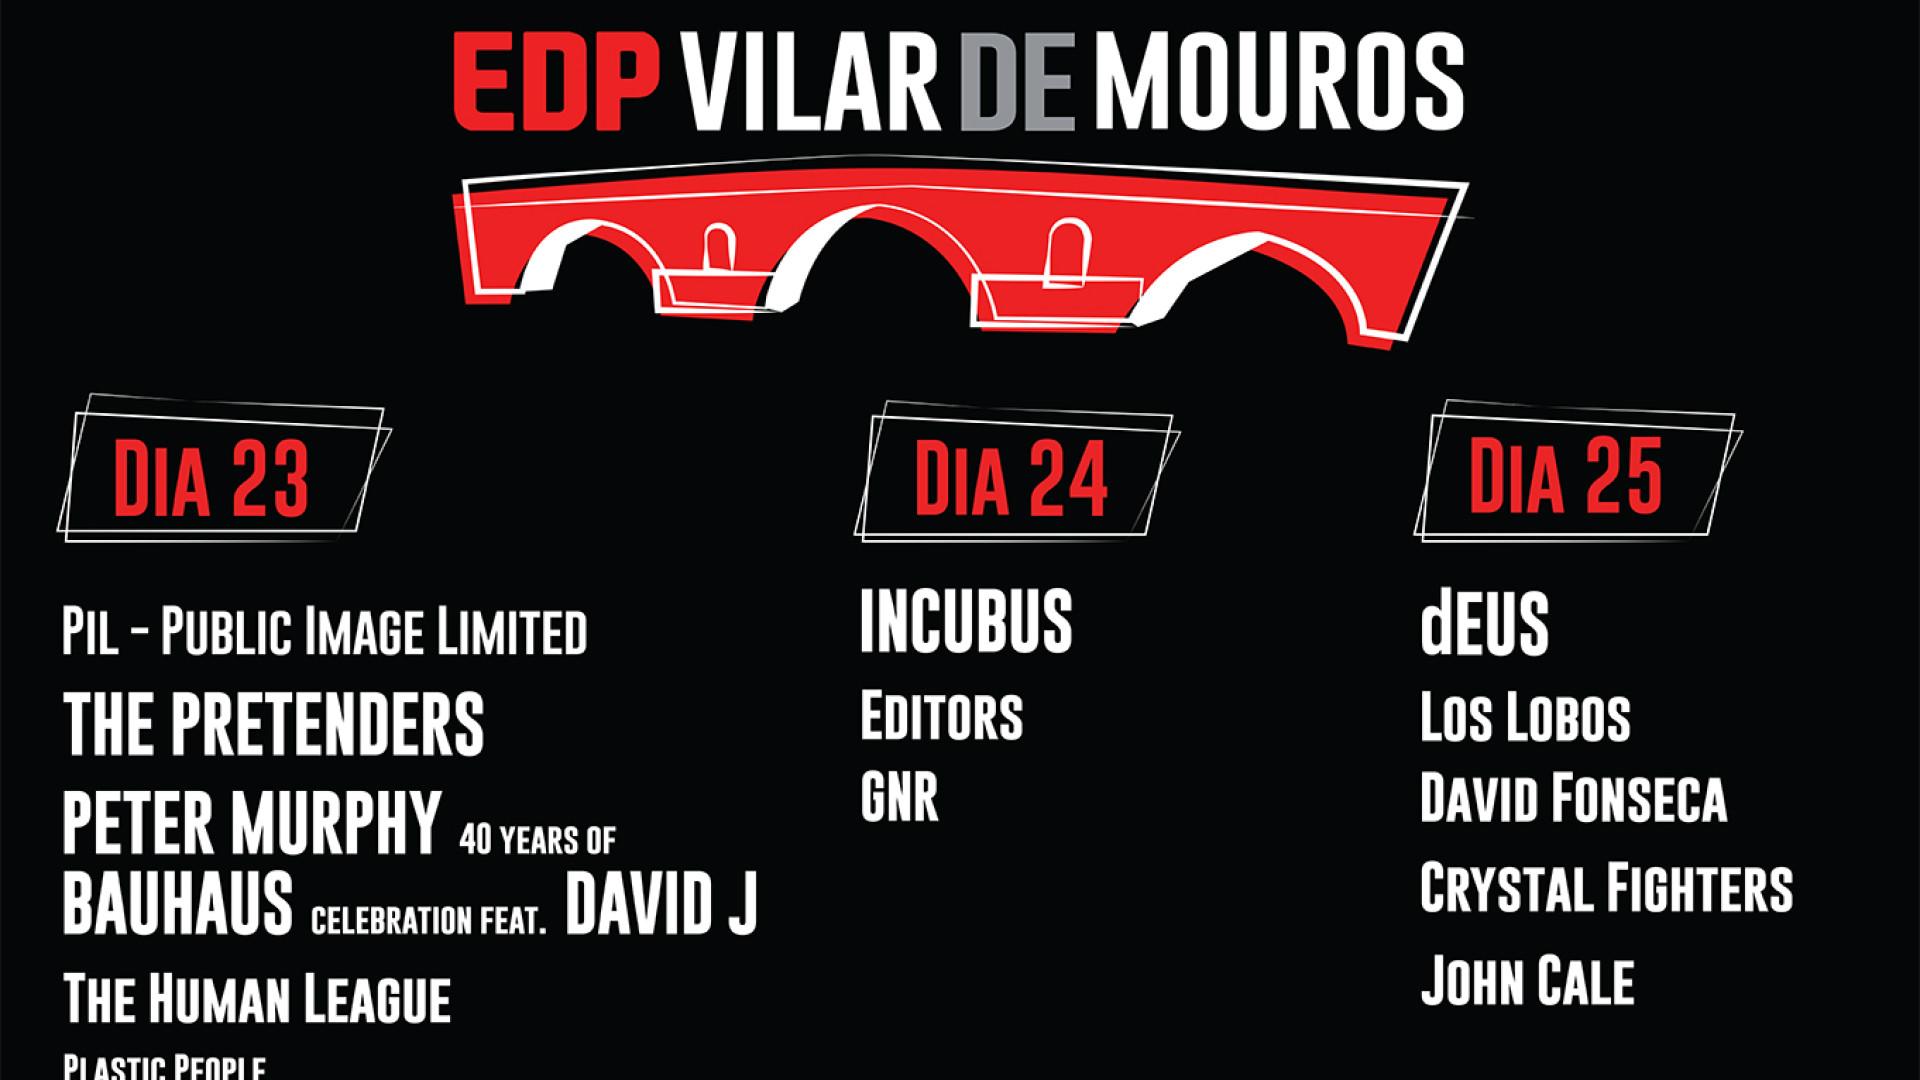 Editors e dEUS confirmados no EDP Vilar de Mouros